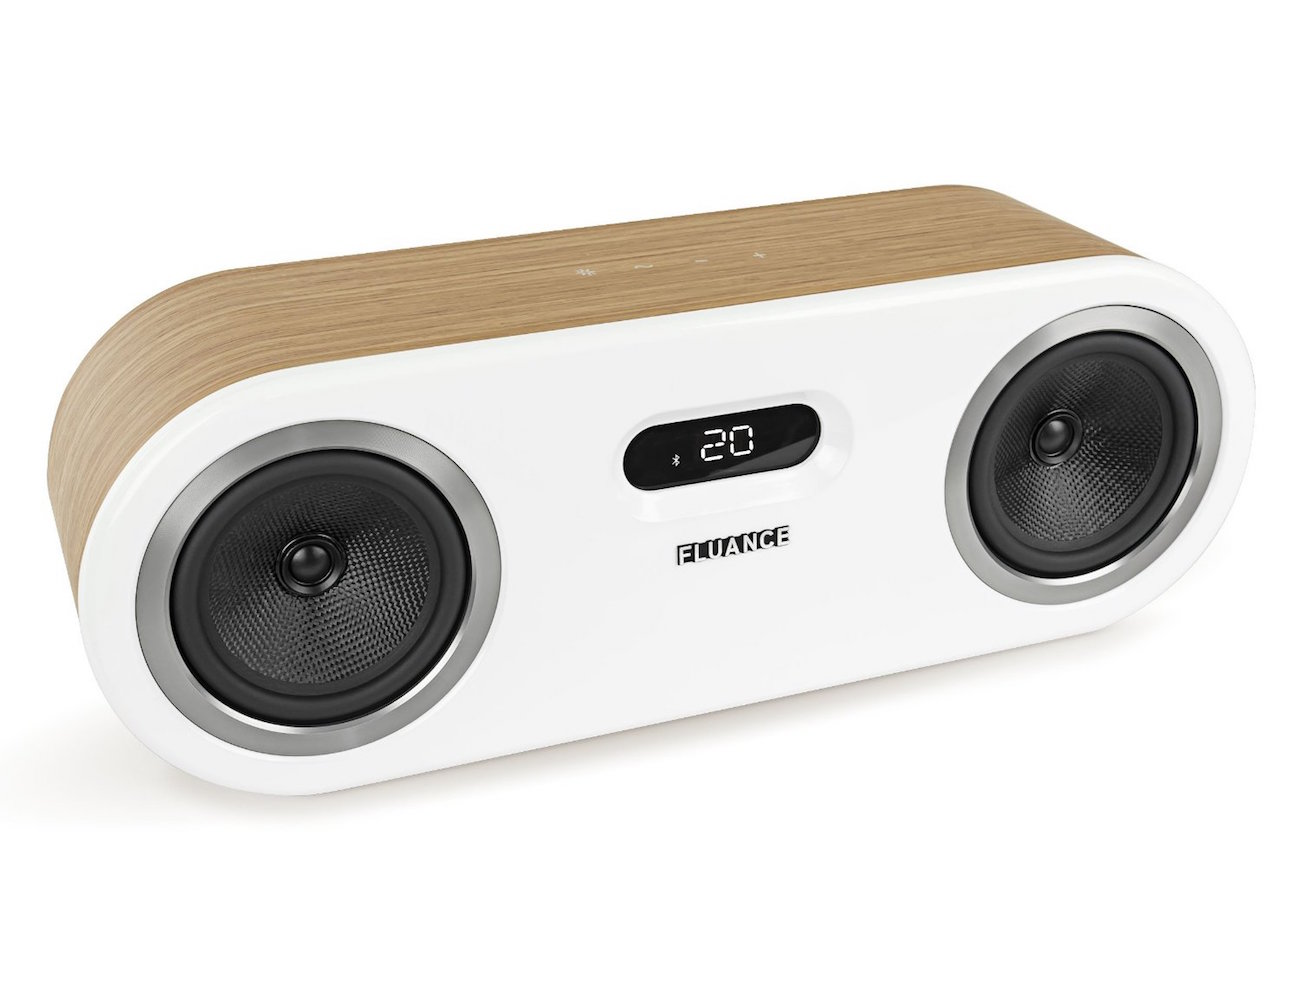 fluance-fi50-high-performance-bluetooth-wood-speaker-system-03